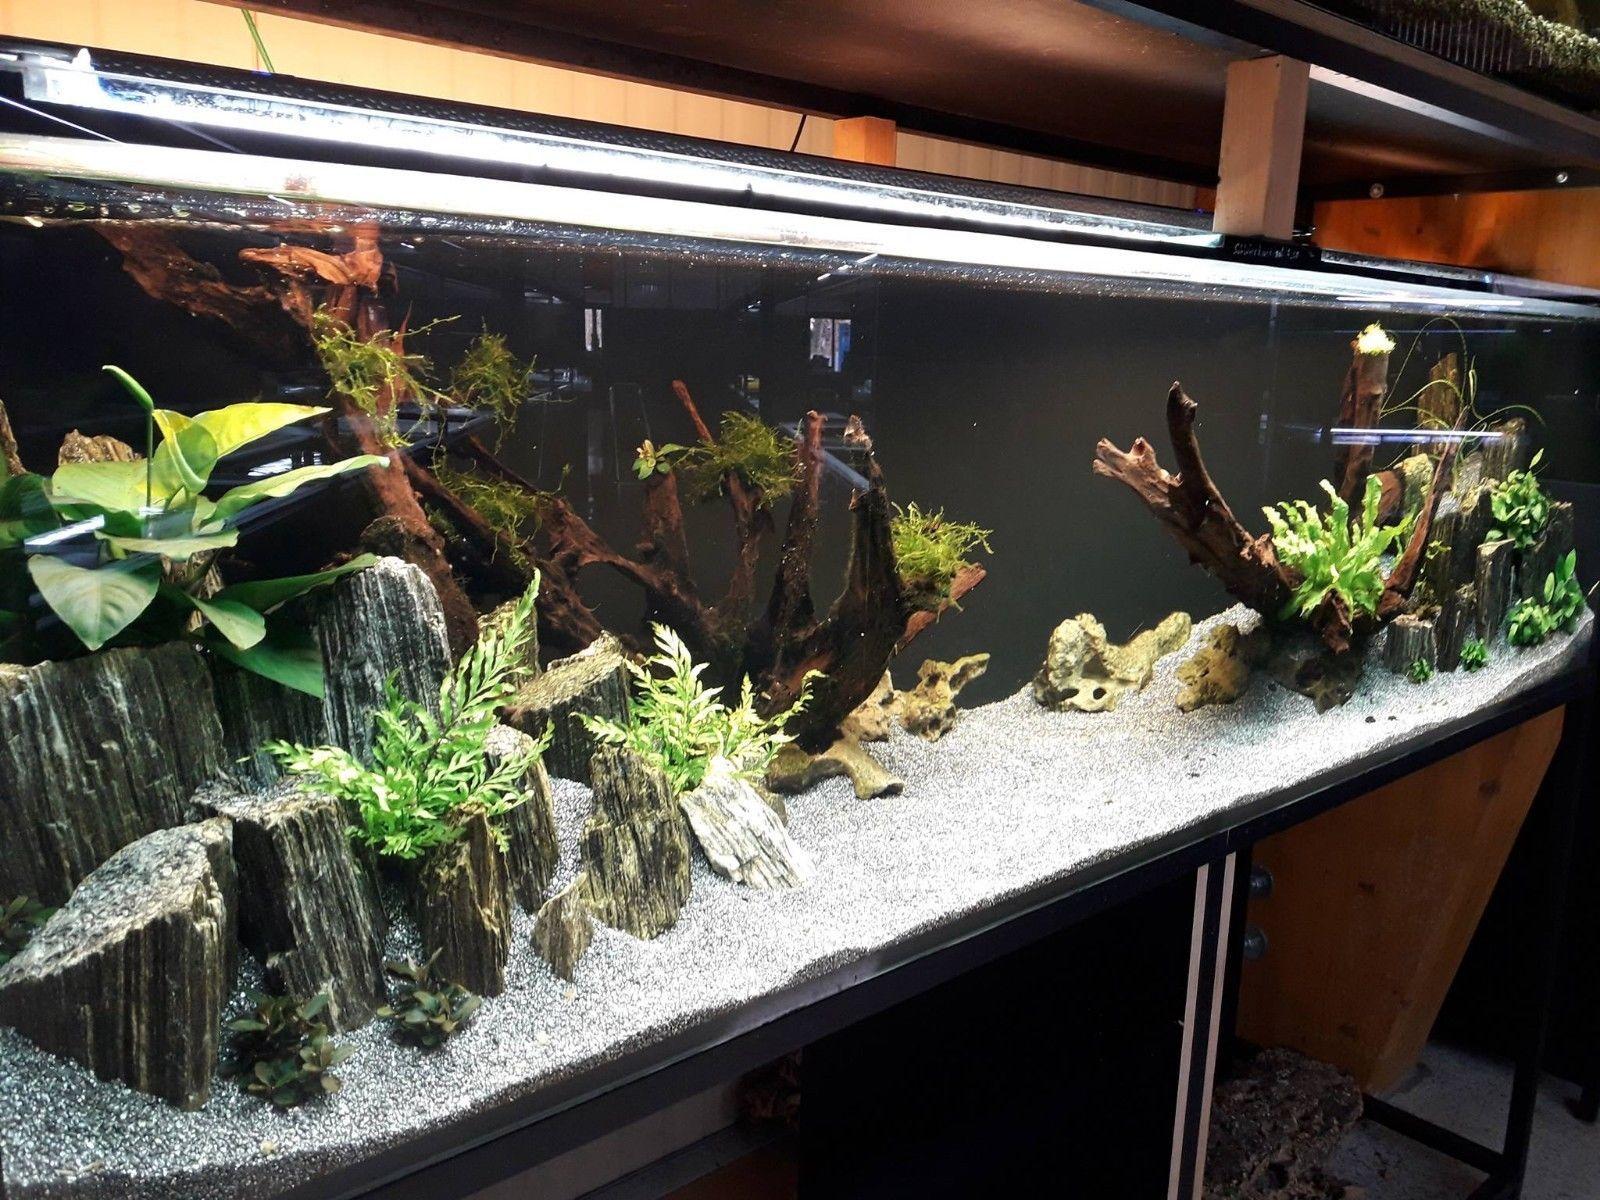 40 Kg Natural Wood Stone For An Aquarium Aquascaping Iwagumi Style Ebay Ideias Para Aquario Aquarios Terrarios